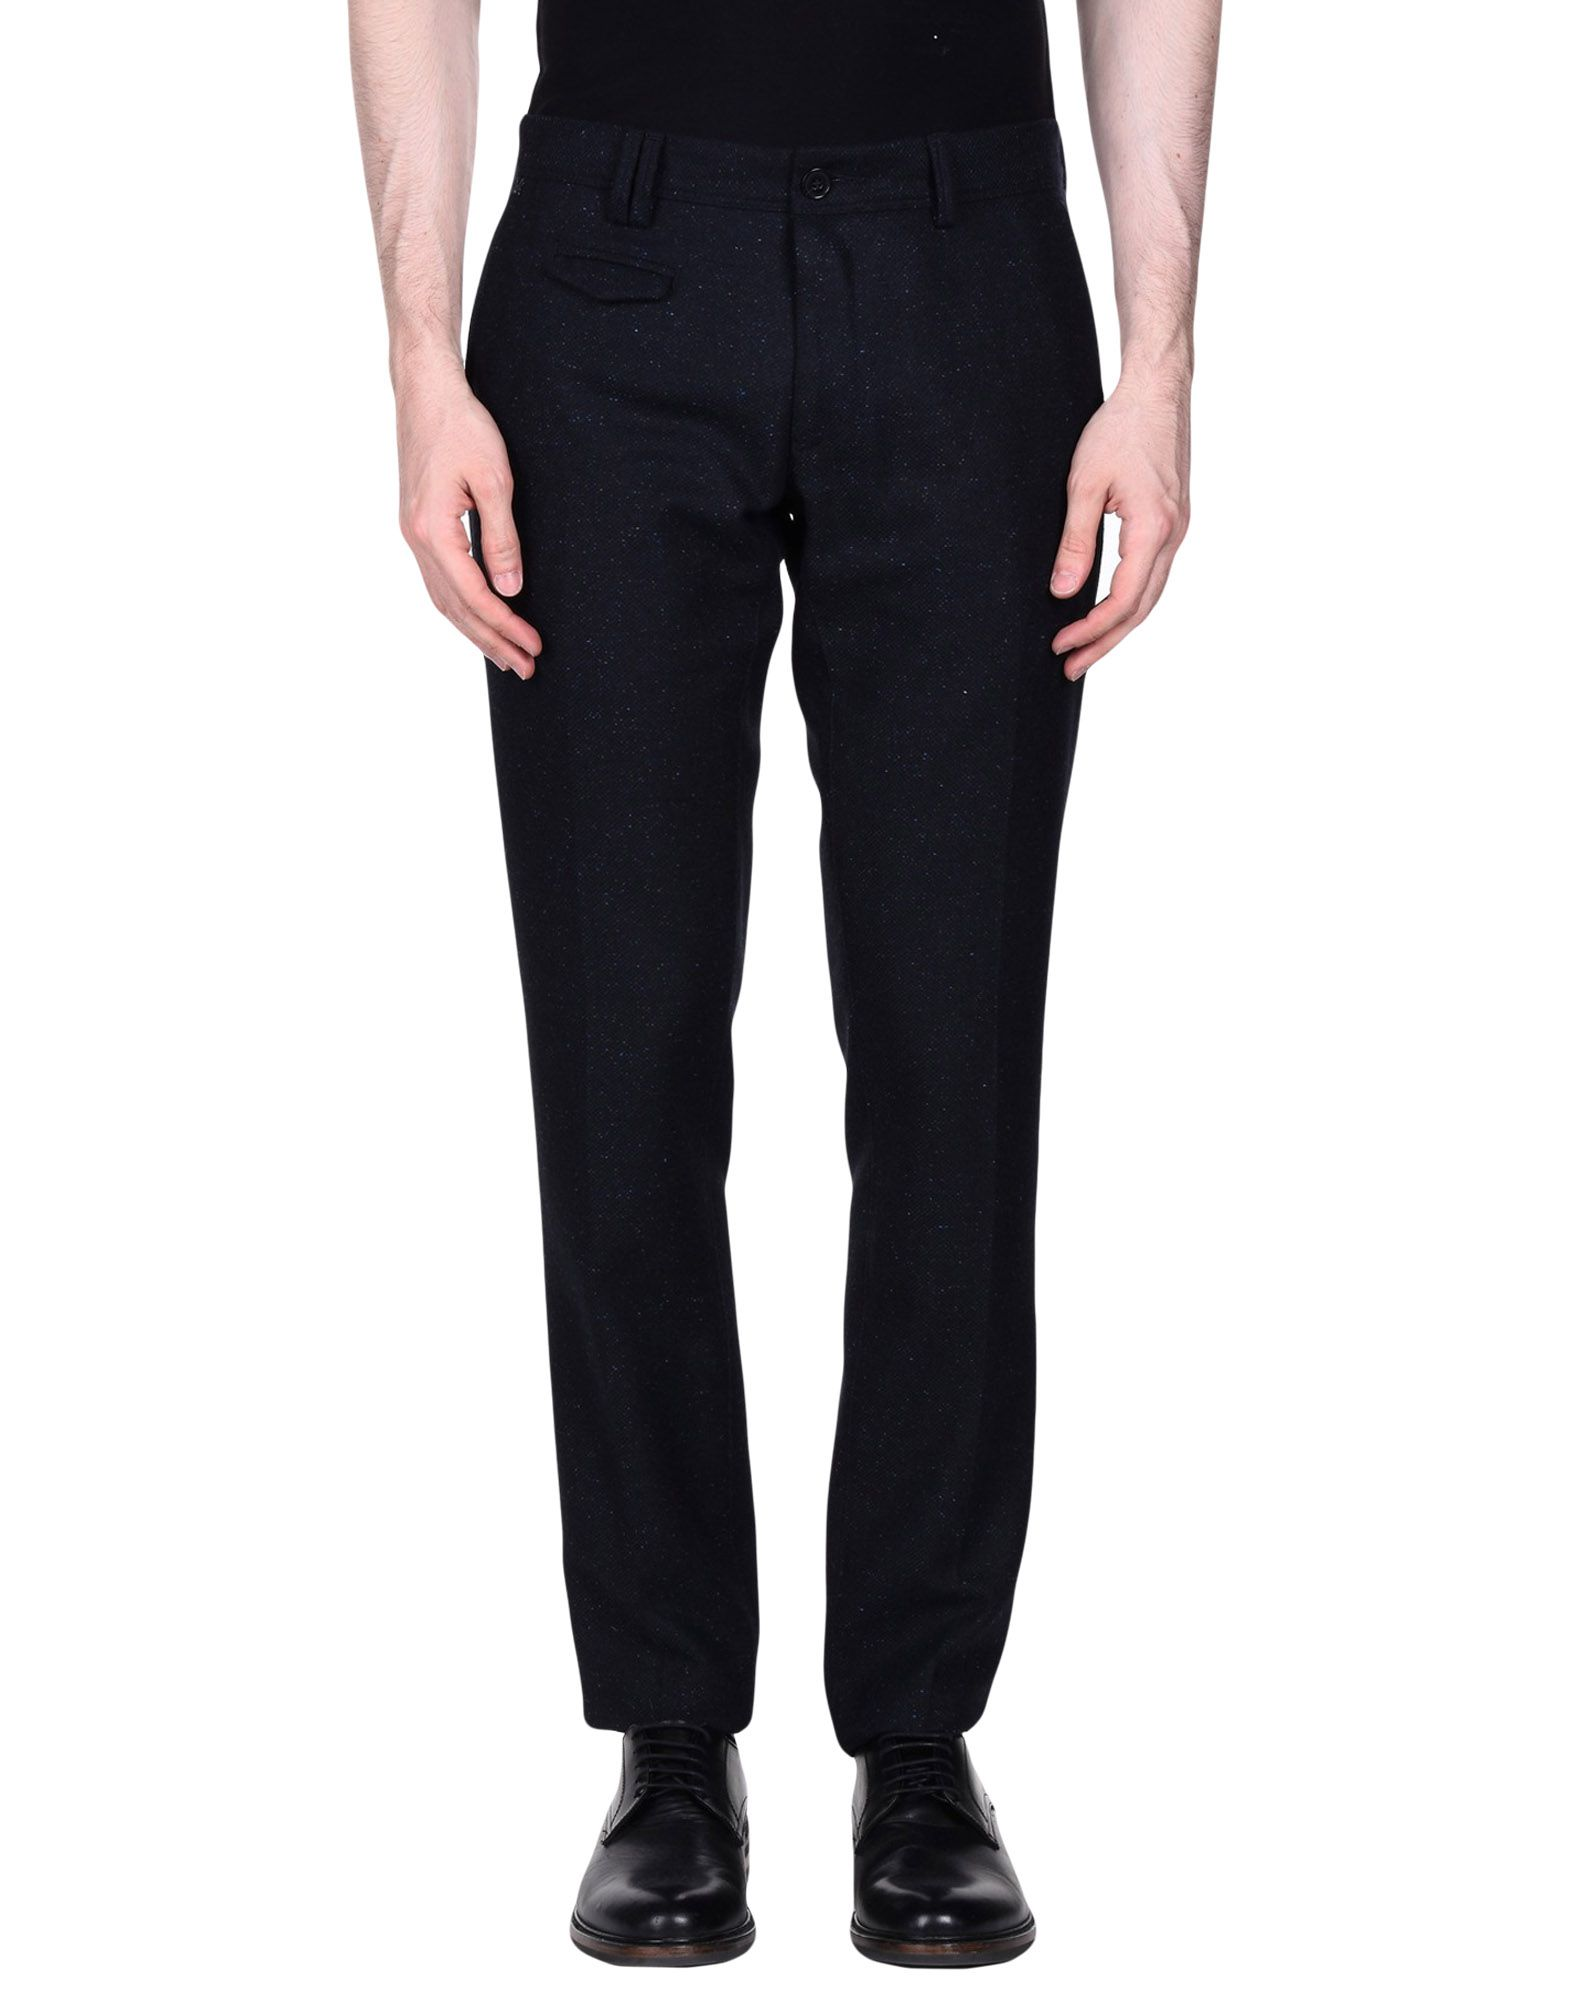 Pantalone Messagerie Donna - Acquista online su